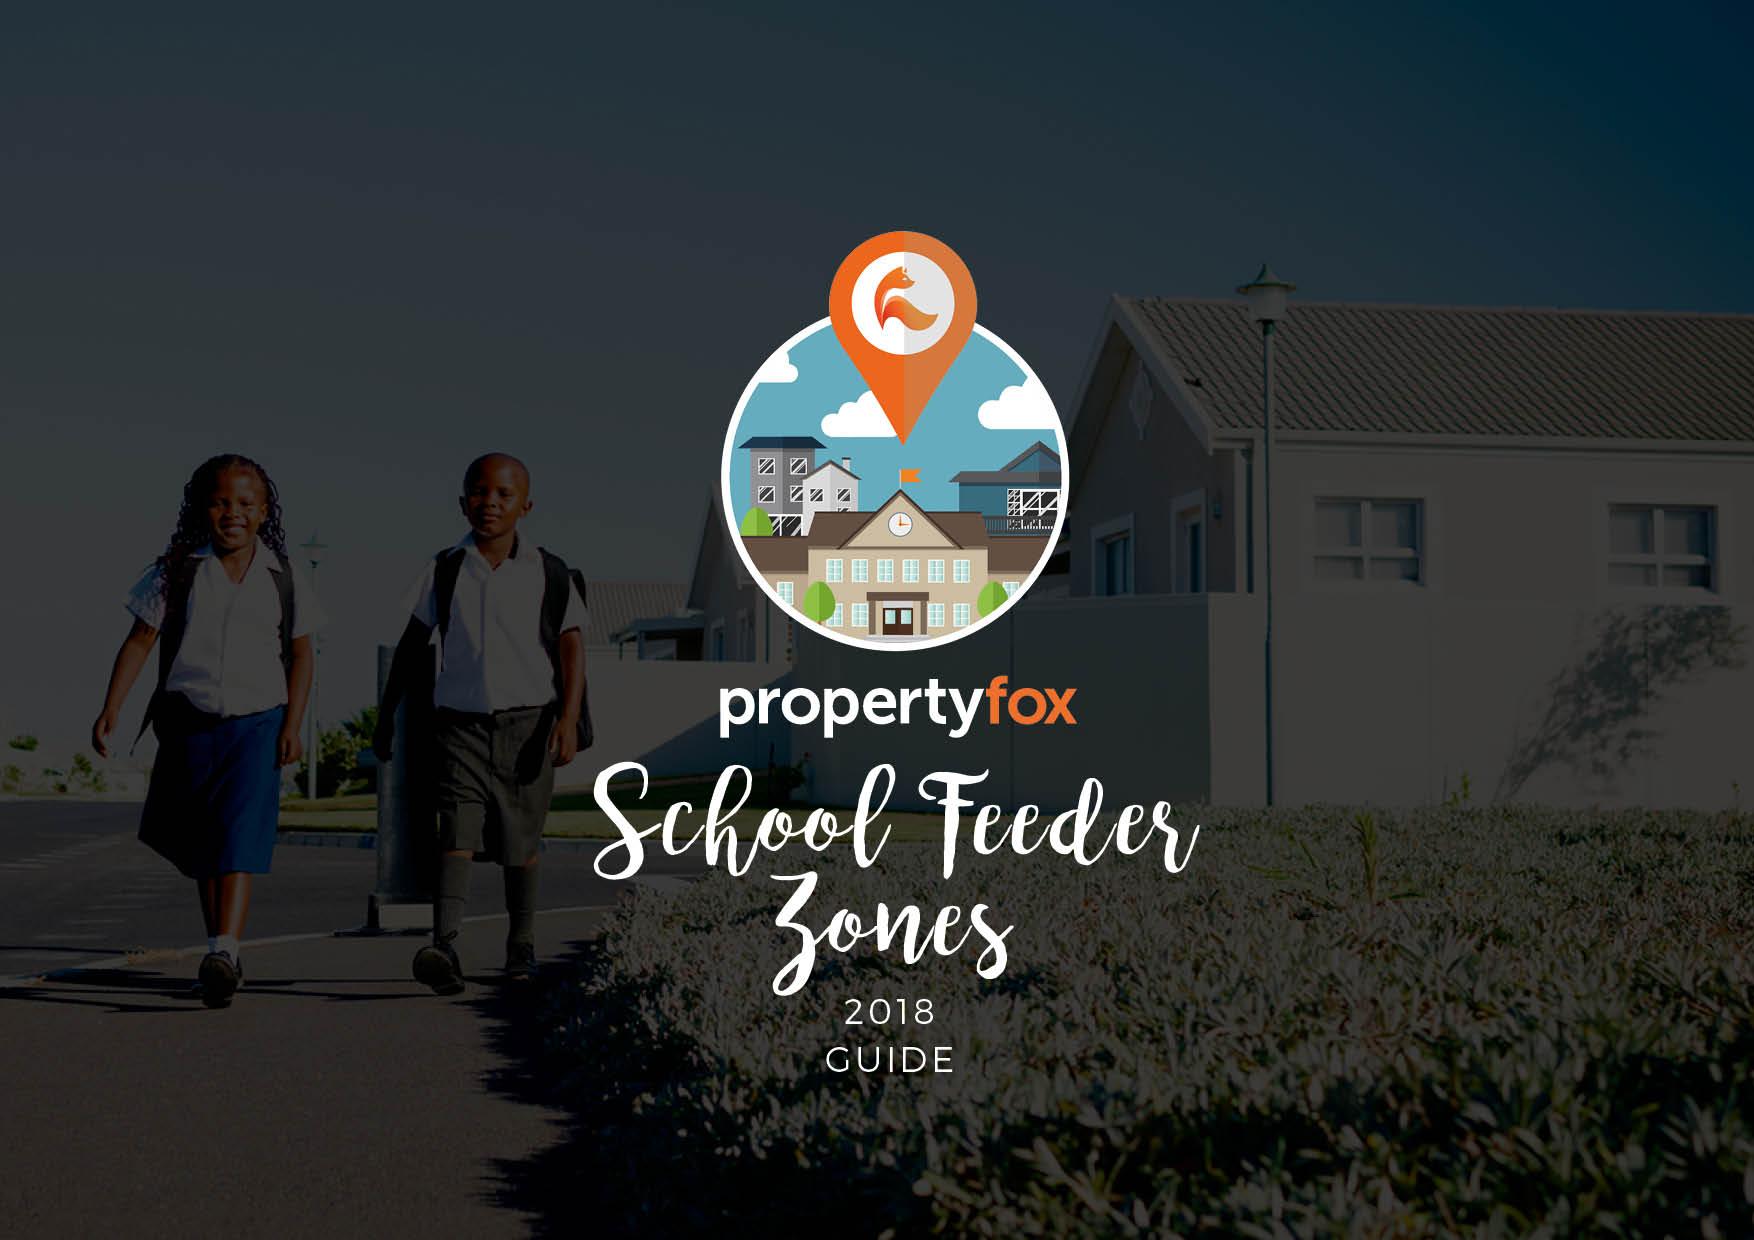 PF School Report